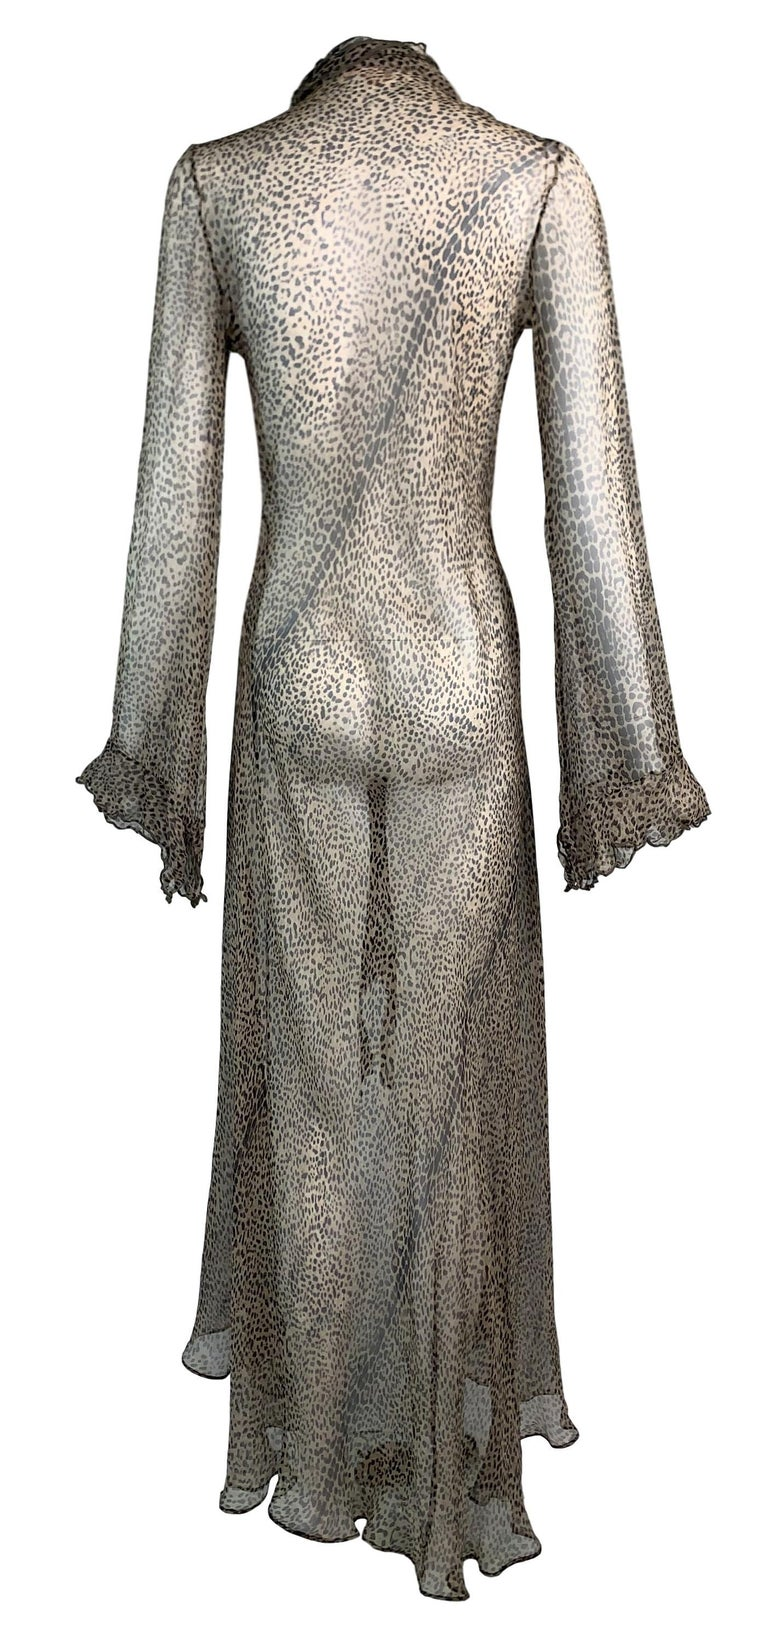 S/S 2002 Roberto Cavalli Runway Sheer Leopard Silk Wrap Maxi Dress In Good Condition For Sale In Yukon, OK